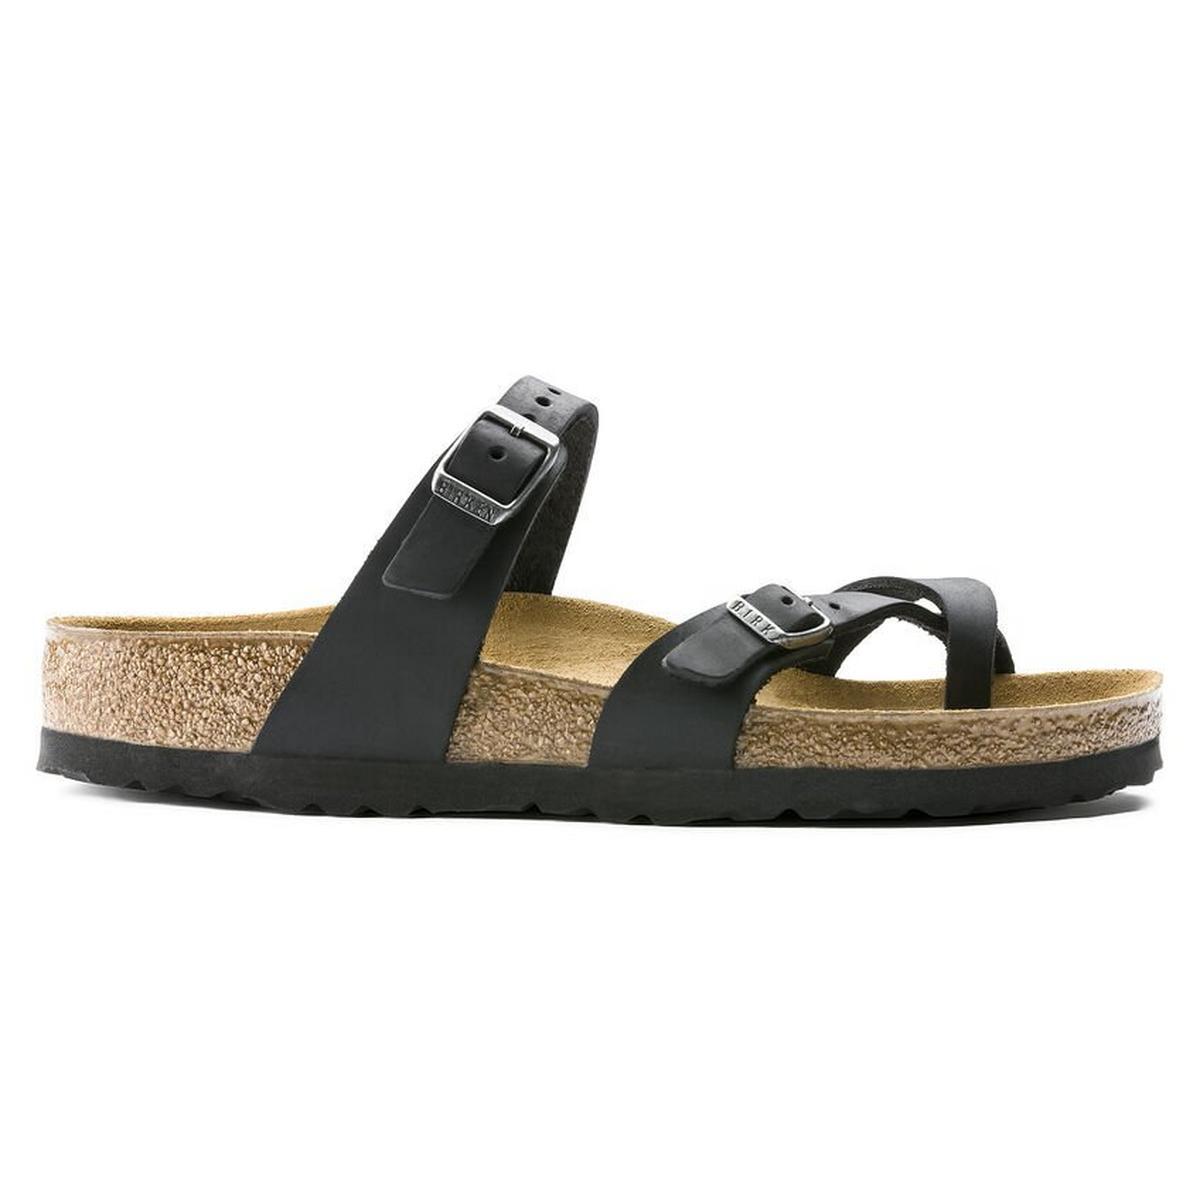 Birkenstock Sandals Women's Mayari Regular Black/Oiled Leather